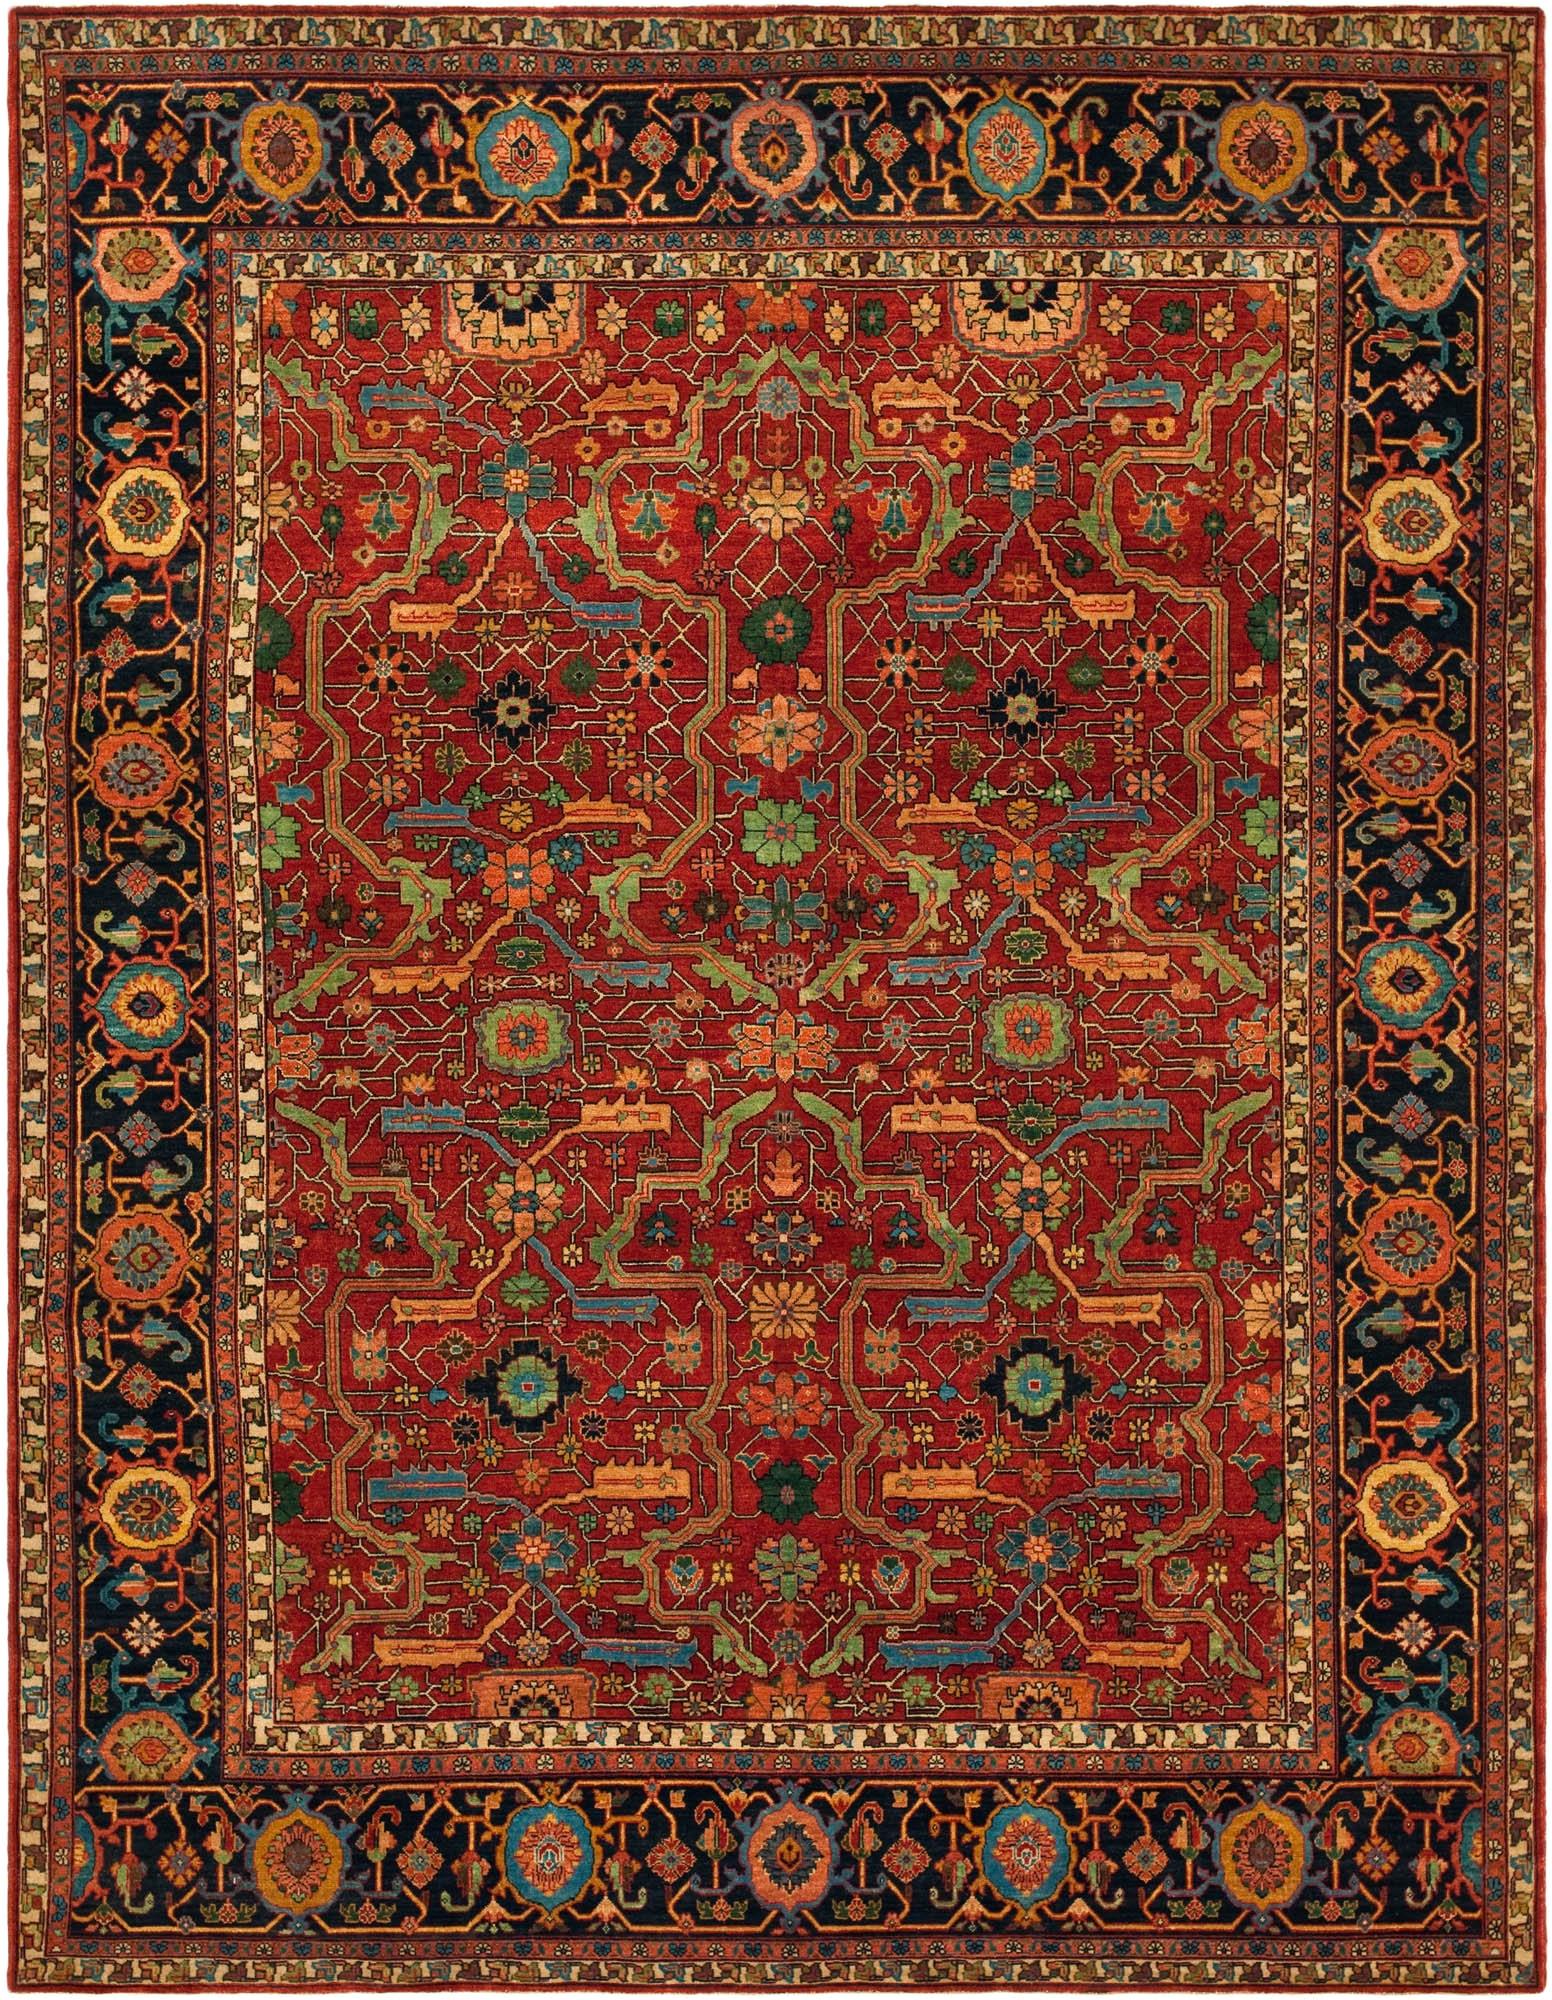 luxury photos of ralph lauren rugs home goods 24403 ideas